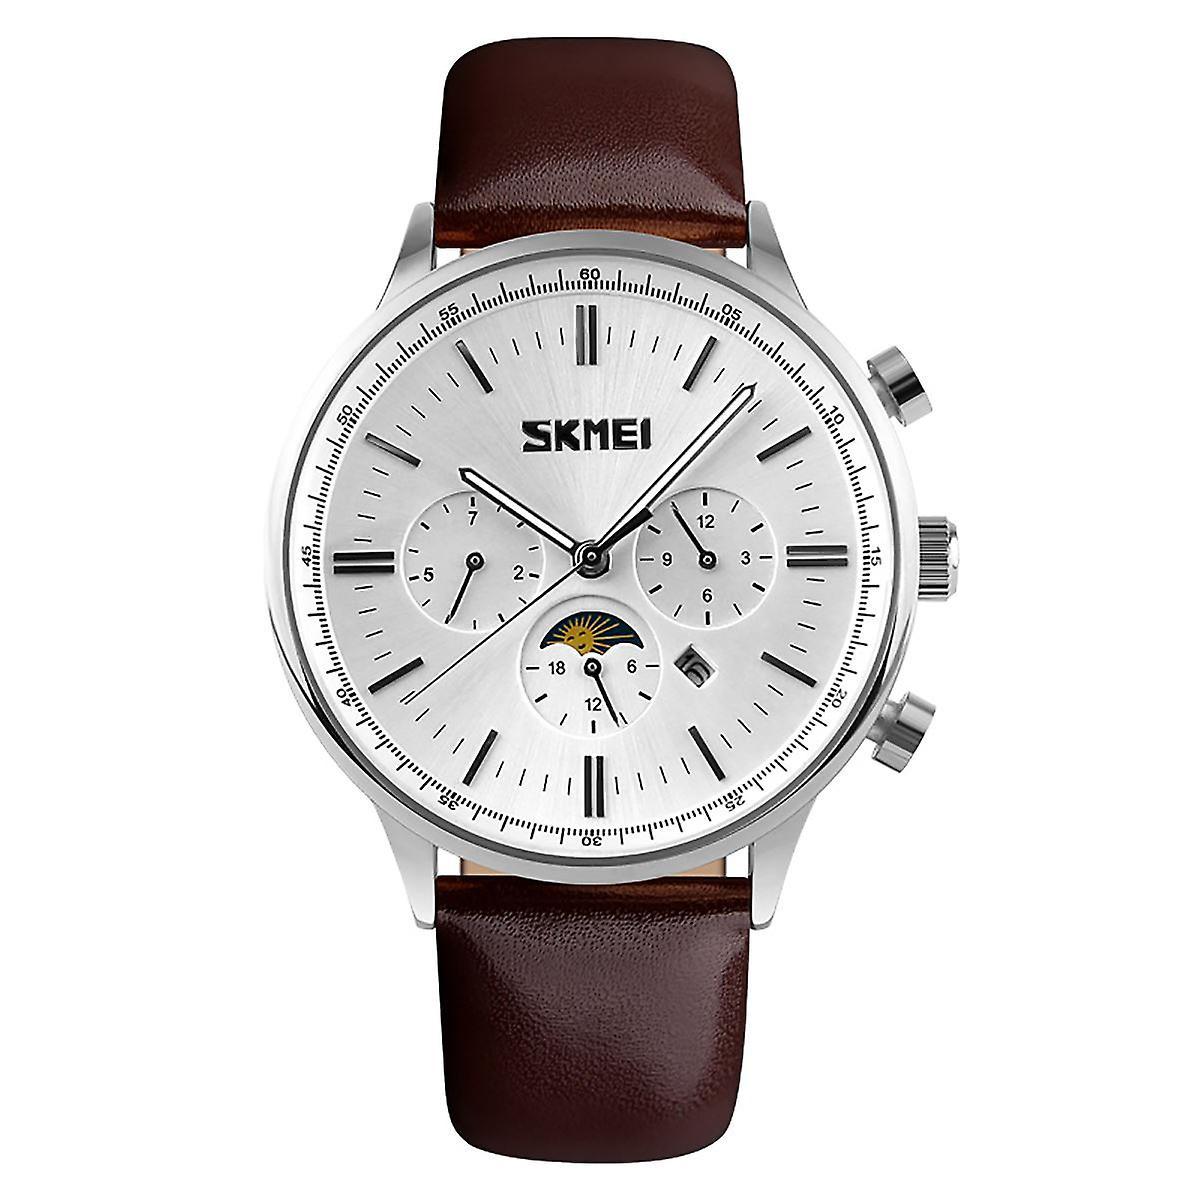 SKMEI Beautiful Quartz Mens Watch Multi Dial Sun Moon Dial Brown Leather Strap 9117S